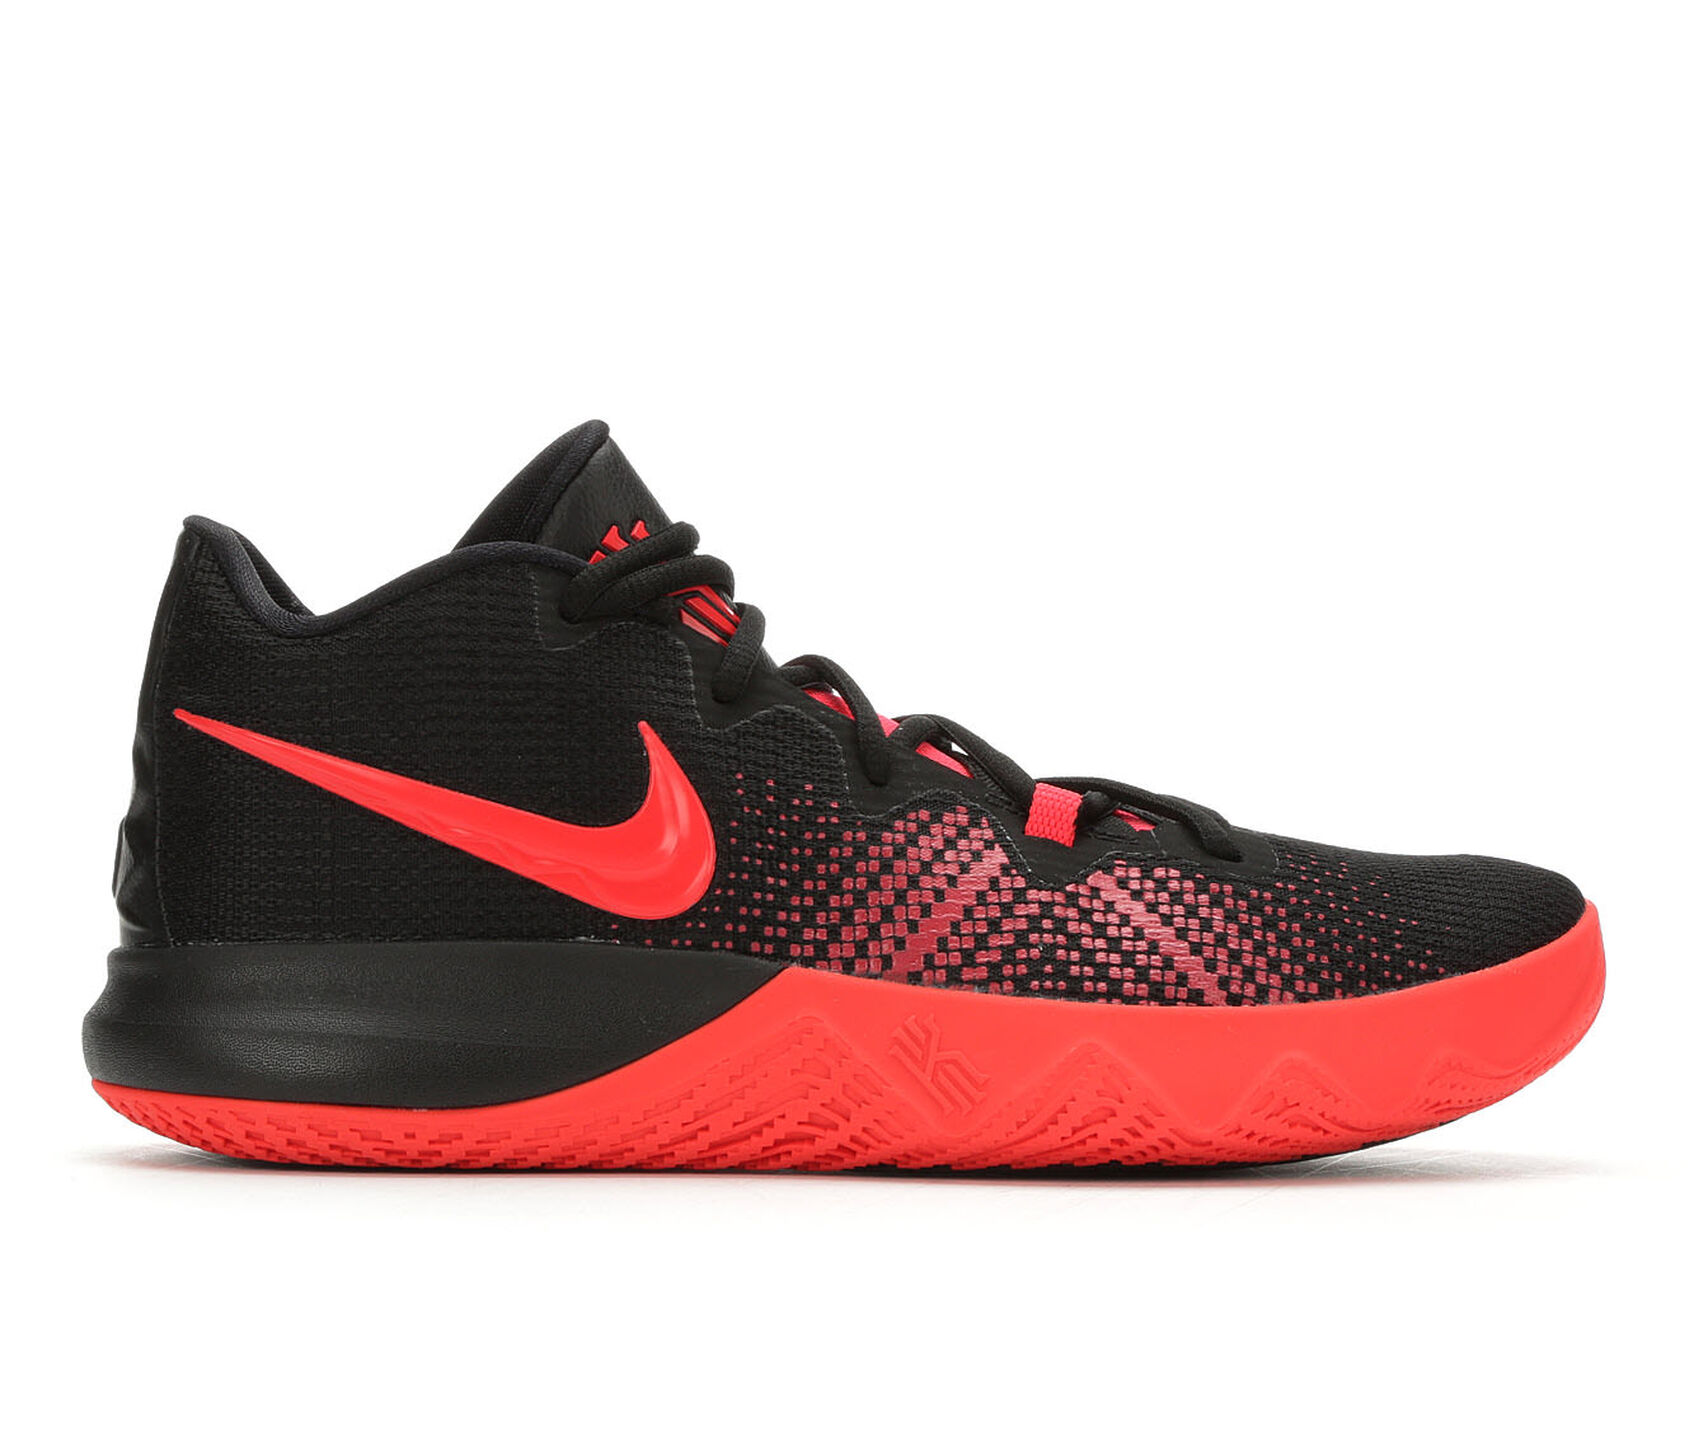 Men's Nike Kyrie Flytrap High Top Basketball Shoes | Shoe ...